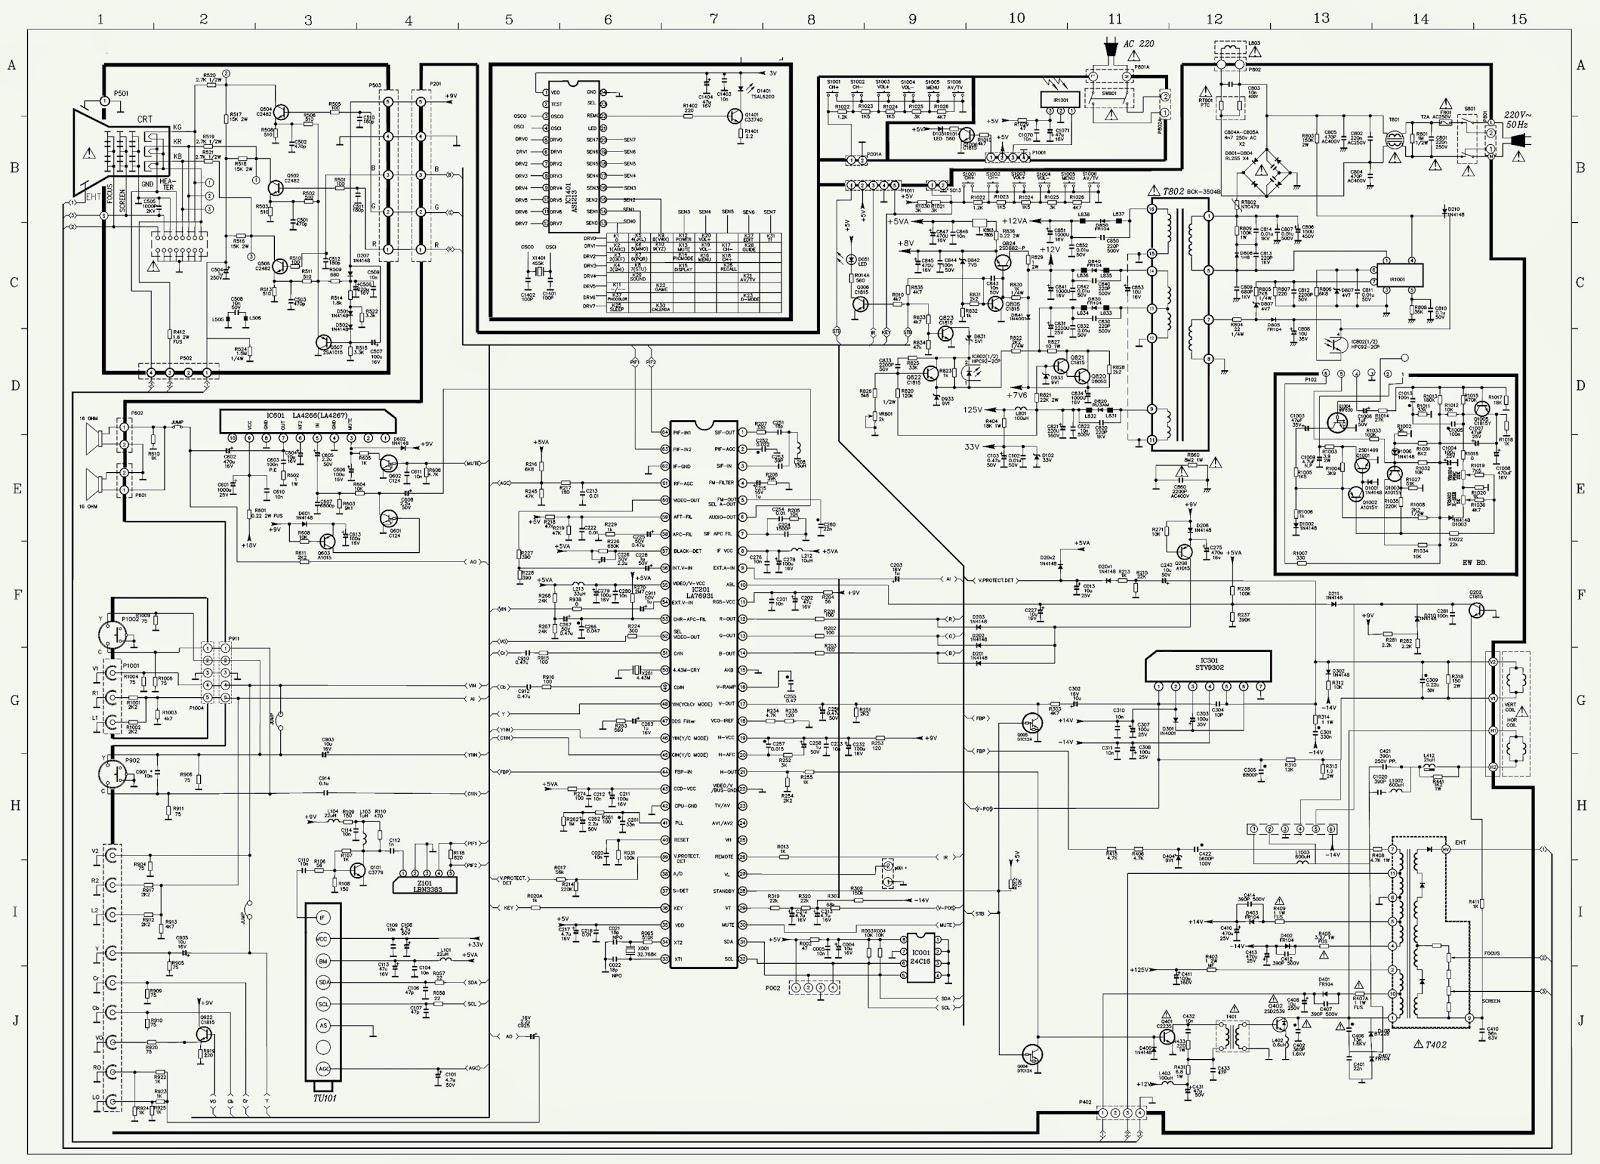 Sensational Ctv Circuit Diagram Using La76931 Ic Electro Help Wiring Cloud Staixuggs Outletorg